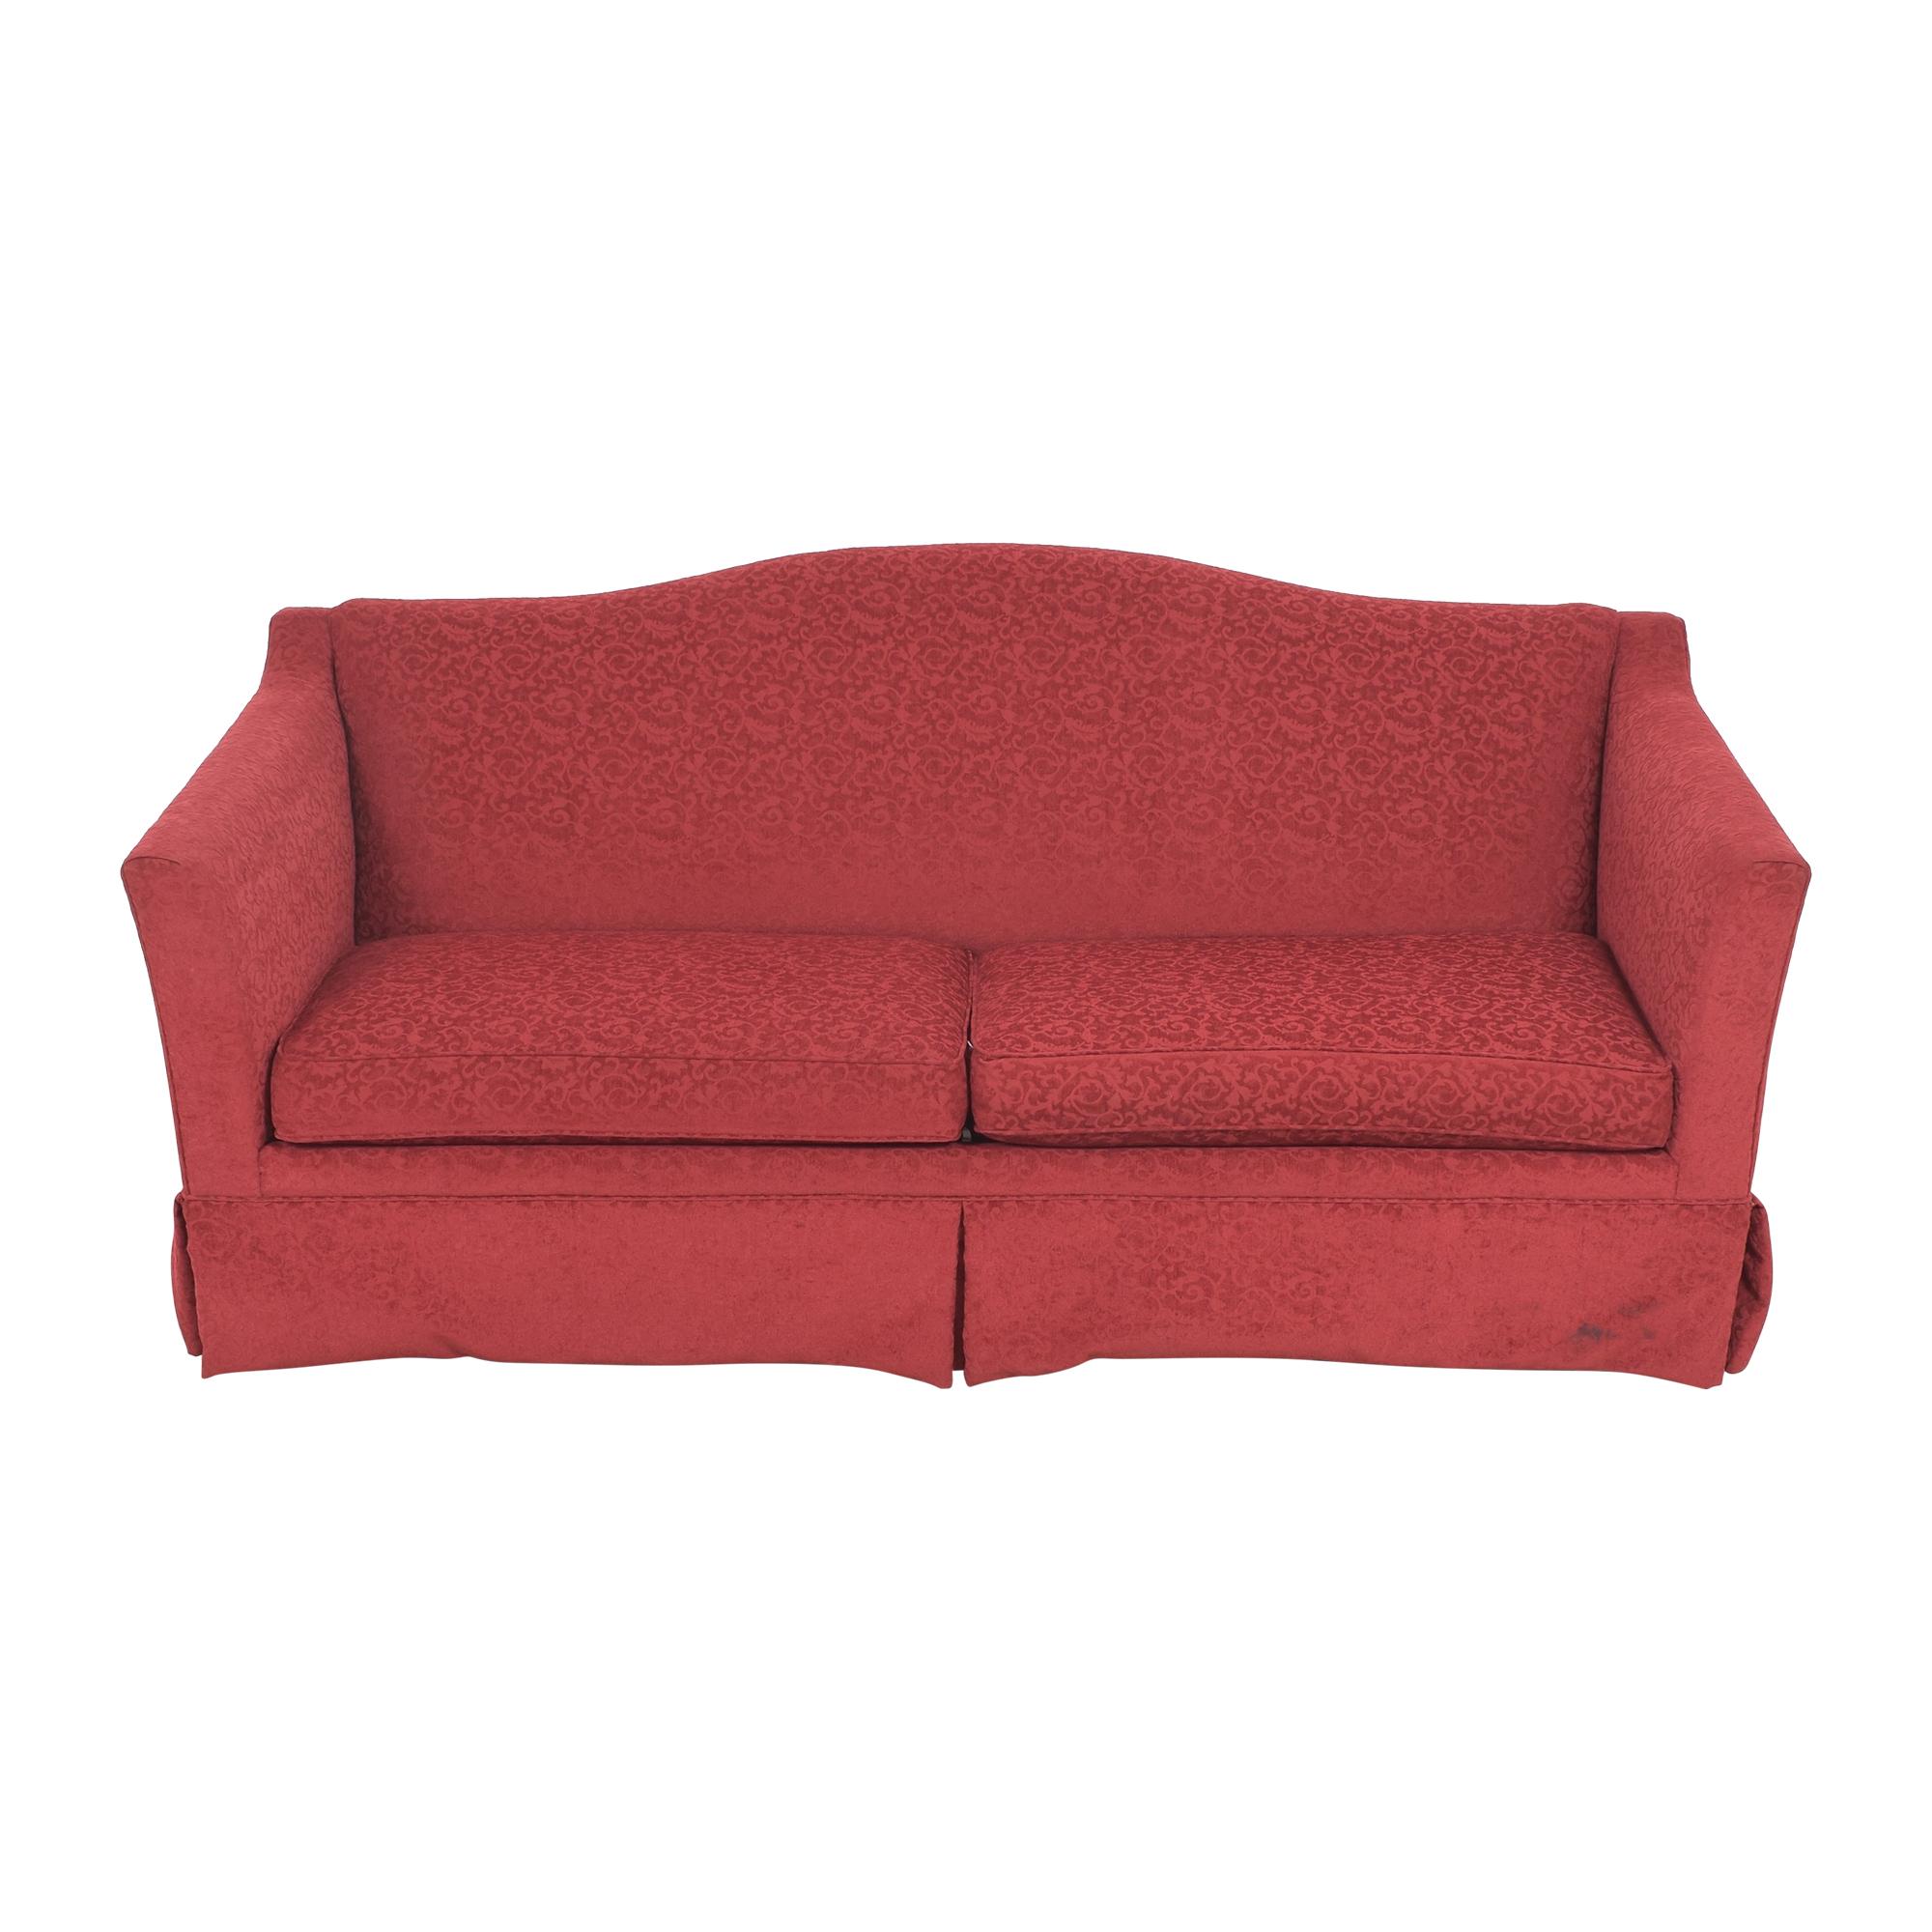 Ethan Allen Ethan Allen Two Cushion Skirted Sofa second hand